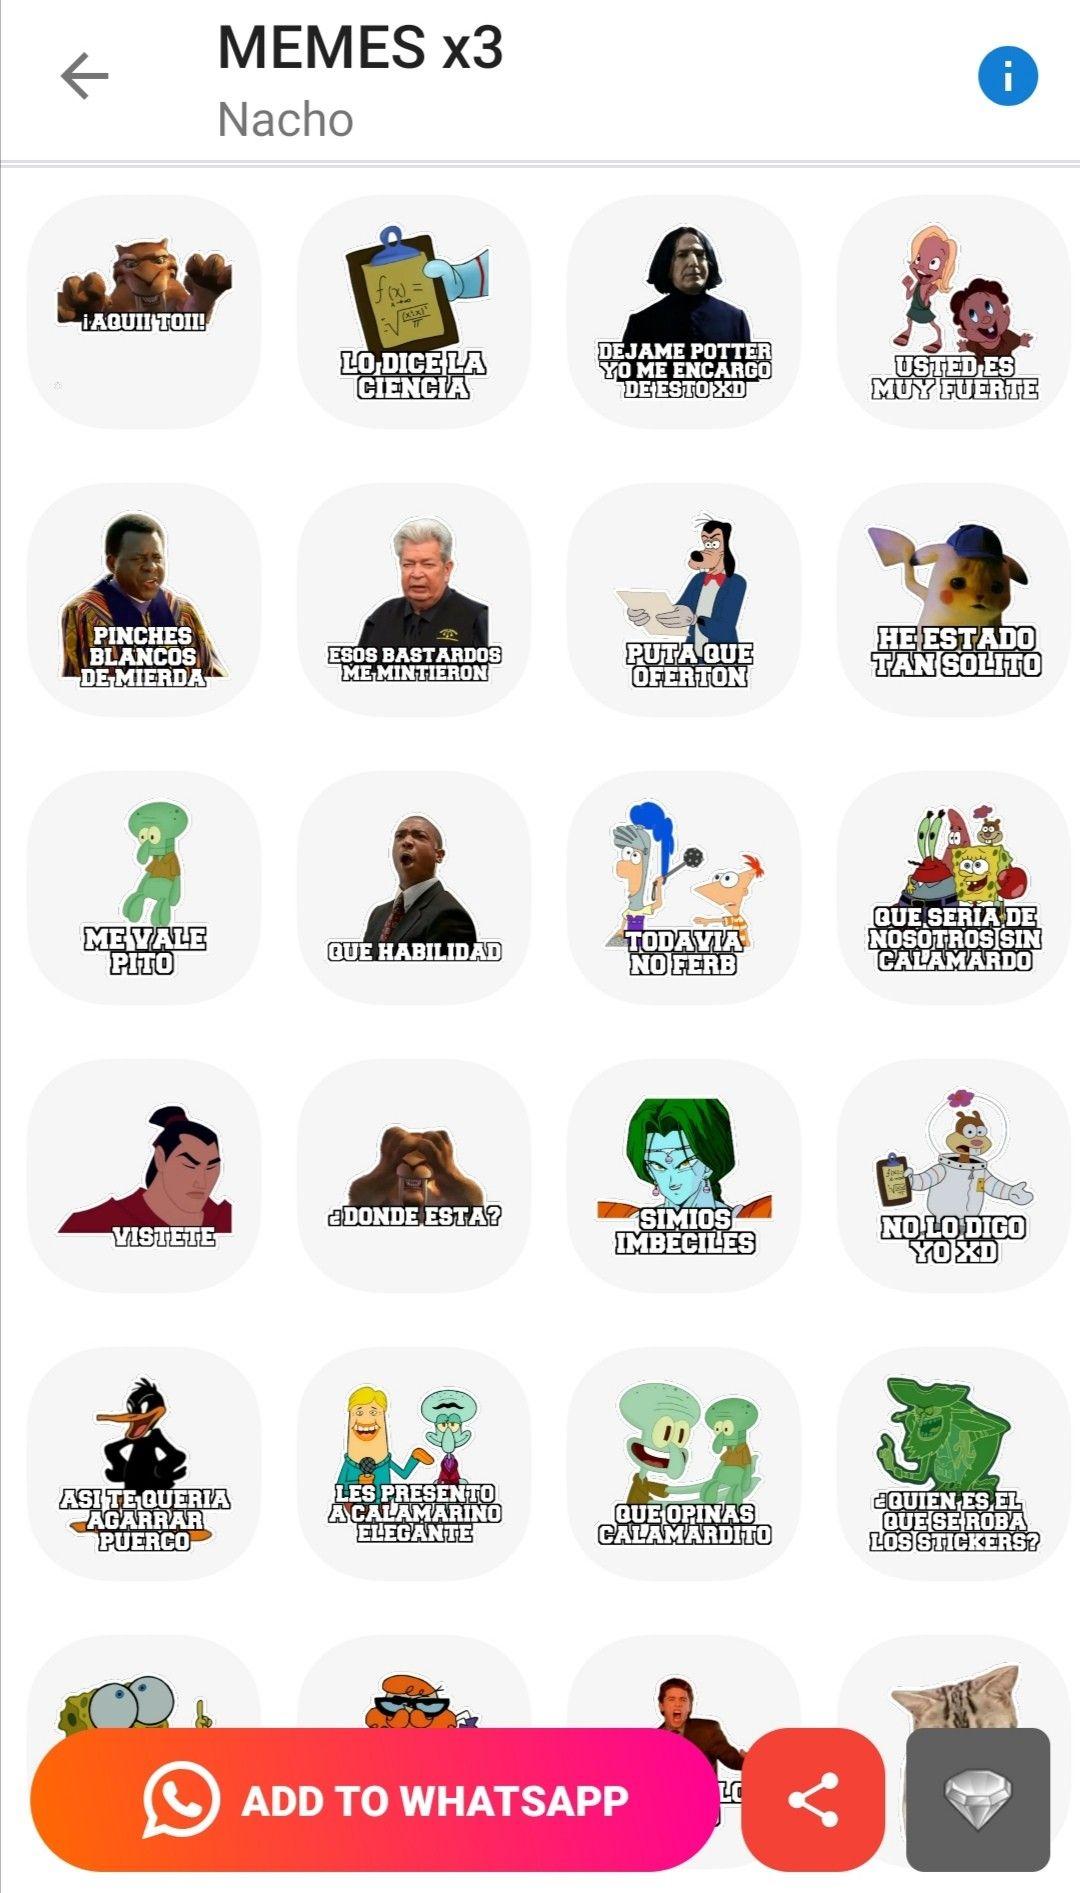 Stickers De Memes X3 Estados Para Whatsapp Memes Programas De Television